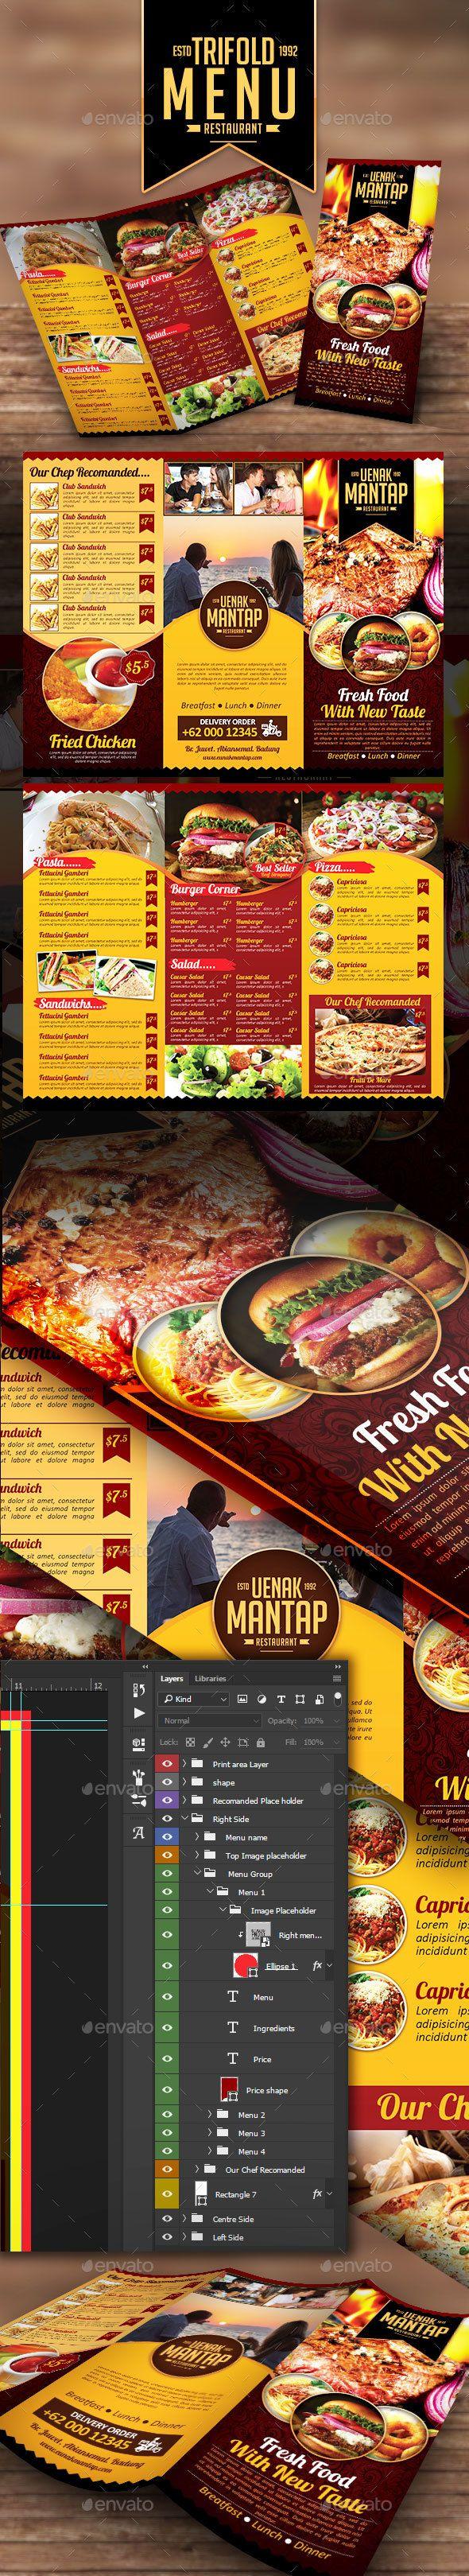 #Restaurant Tri Fold Menu  - Restaurant #Flyers Download here: https://graphicriver.net/item/restaurant-tri-fold-menu-/17053162?ref=alena994